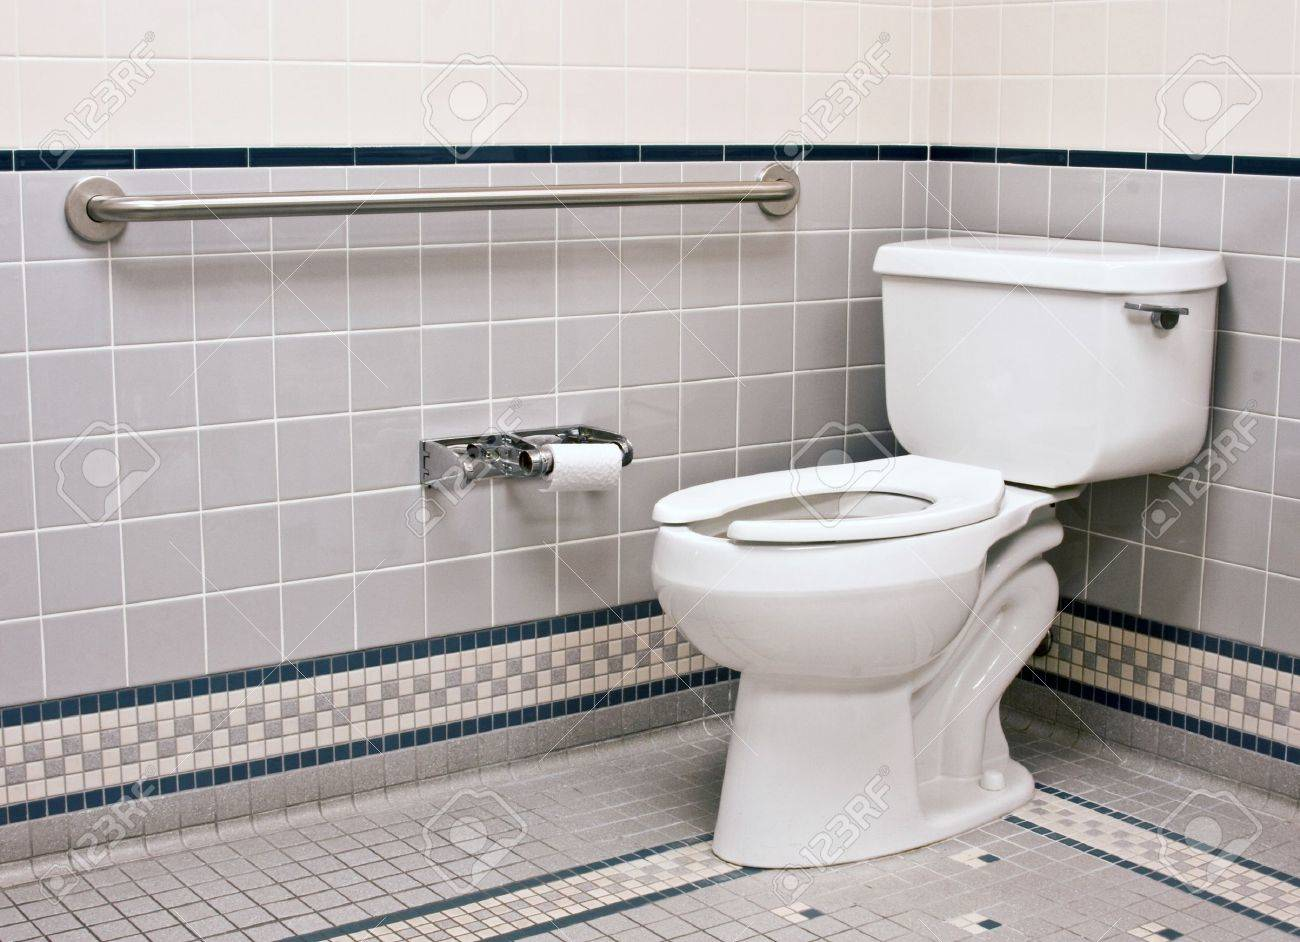 stock photo handicap bathroom with grab bars and ceramic tile